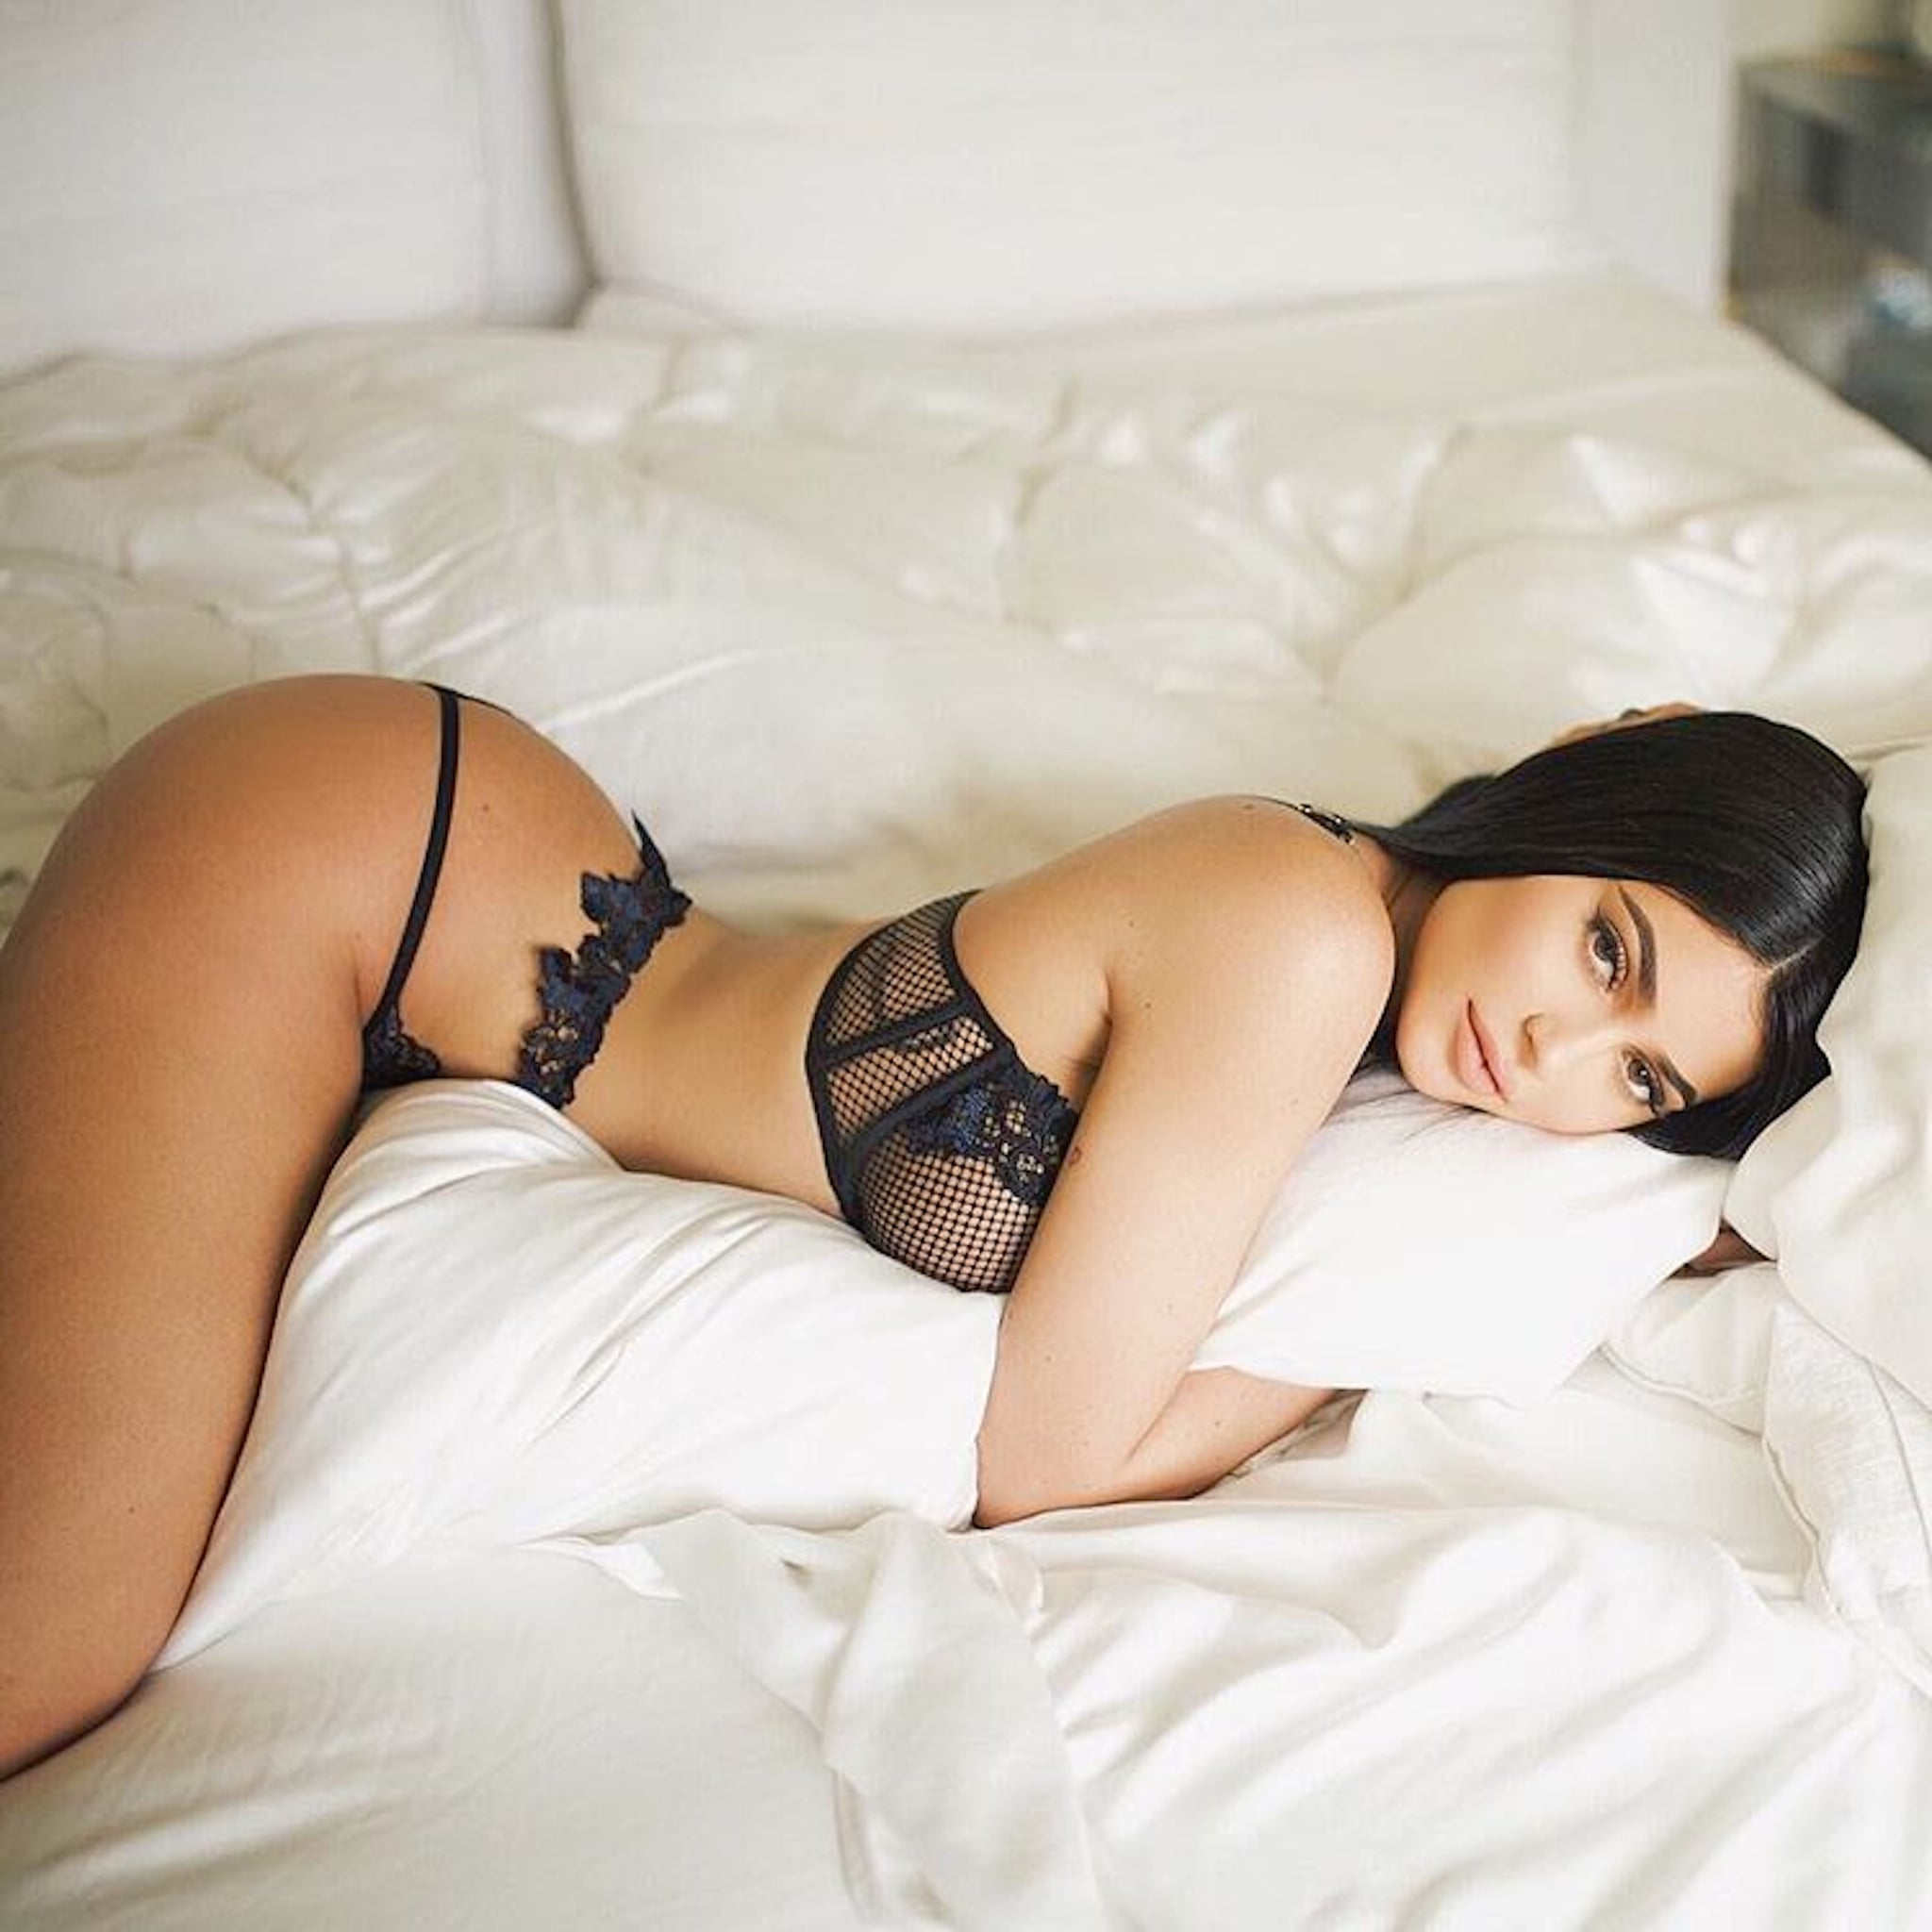 Photoe sexy